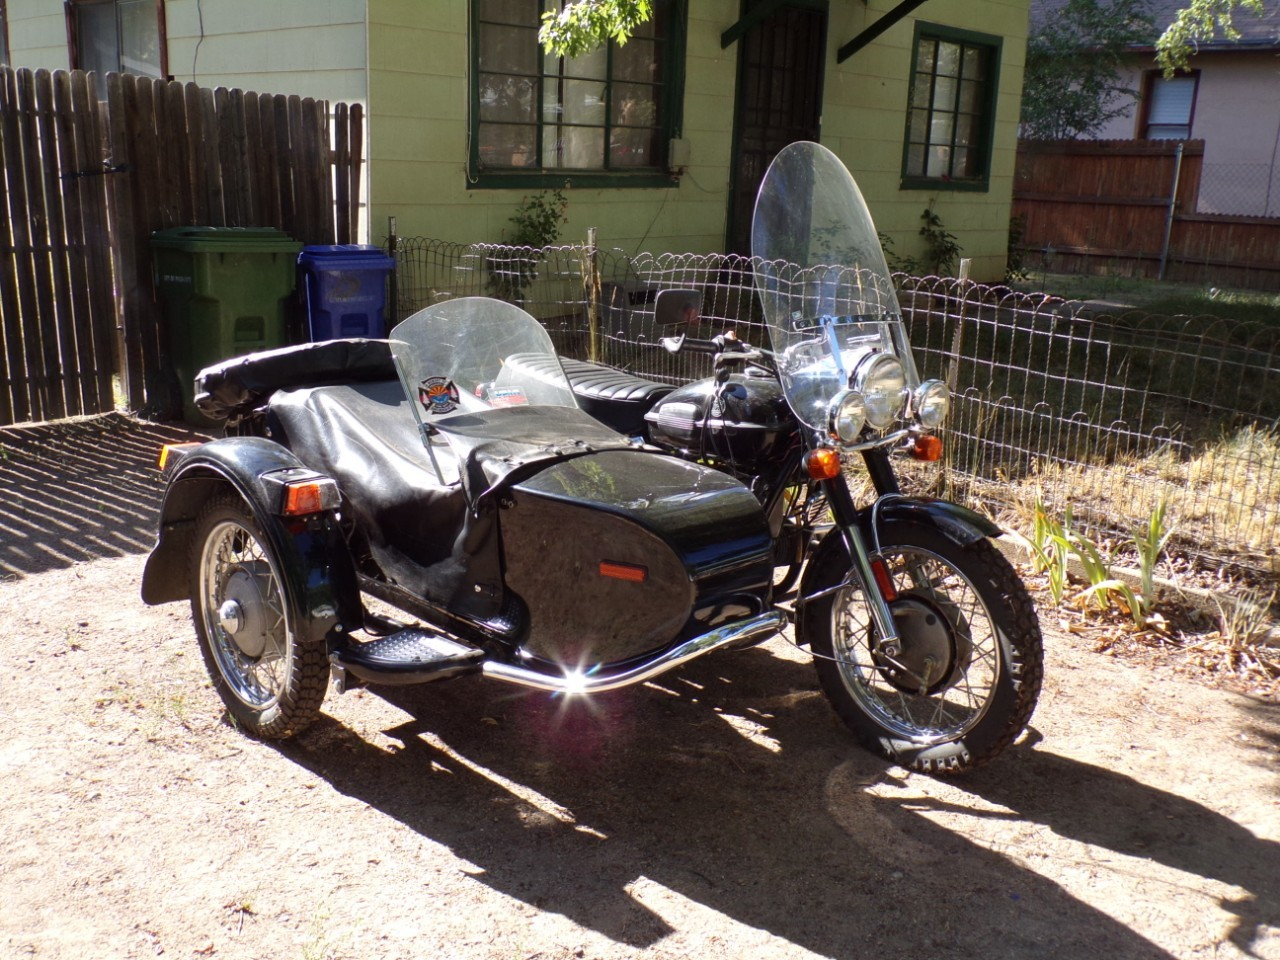 Ural For Sale - Ural Motorcycles - Cycle Trader